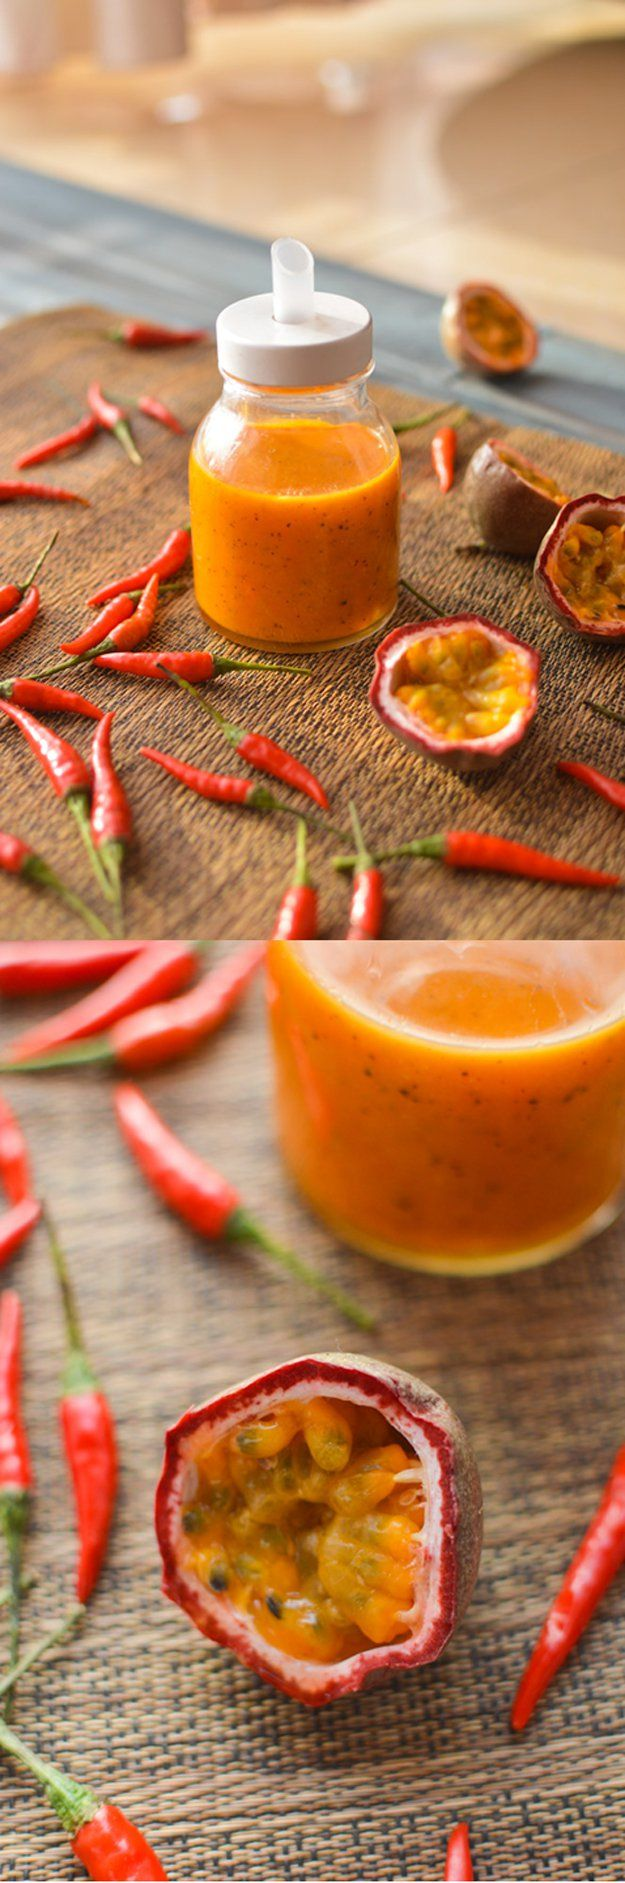 Recetas de salsa de bricolaje fácil frecuentes | http://artesaniasdebricolaje.ru/top-14-hot-sauce-recipes/